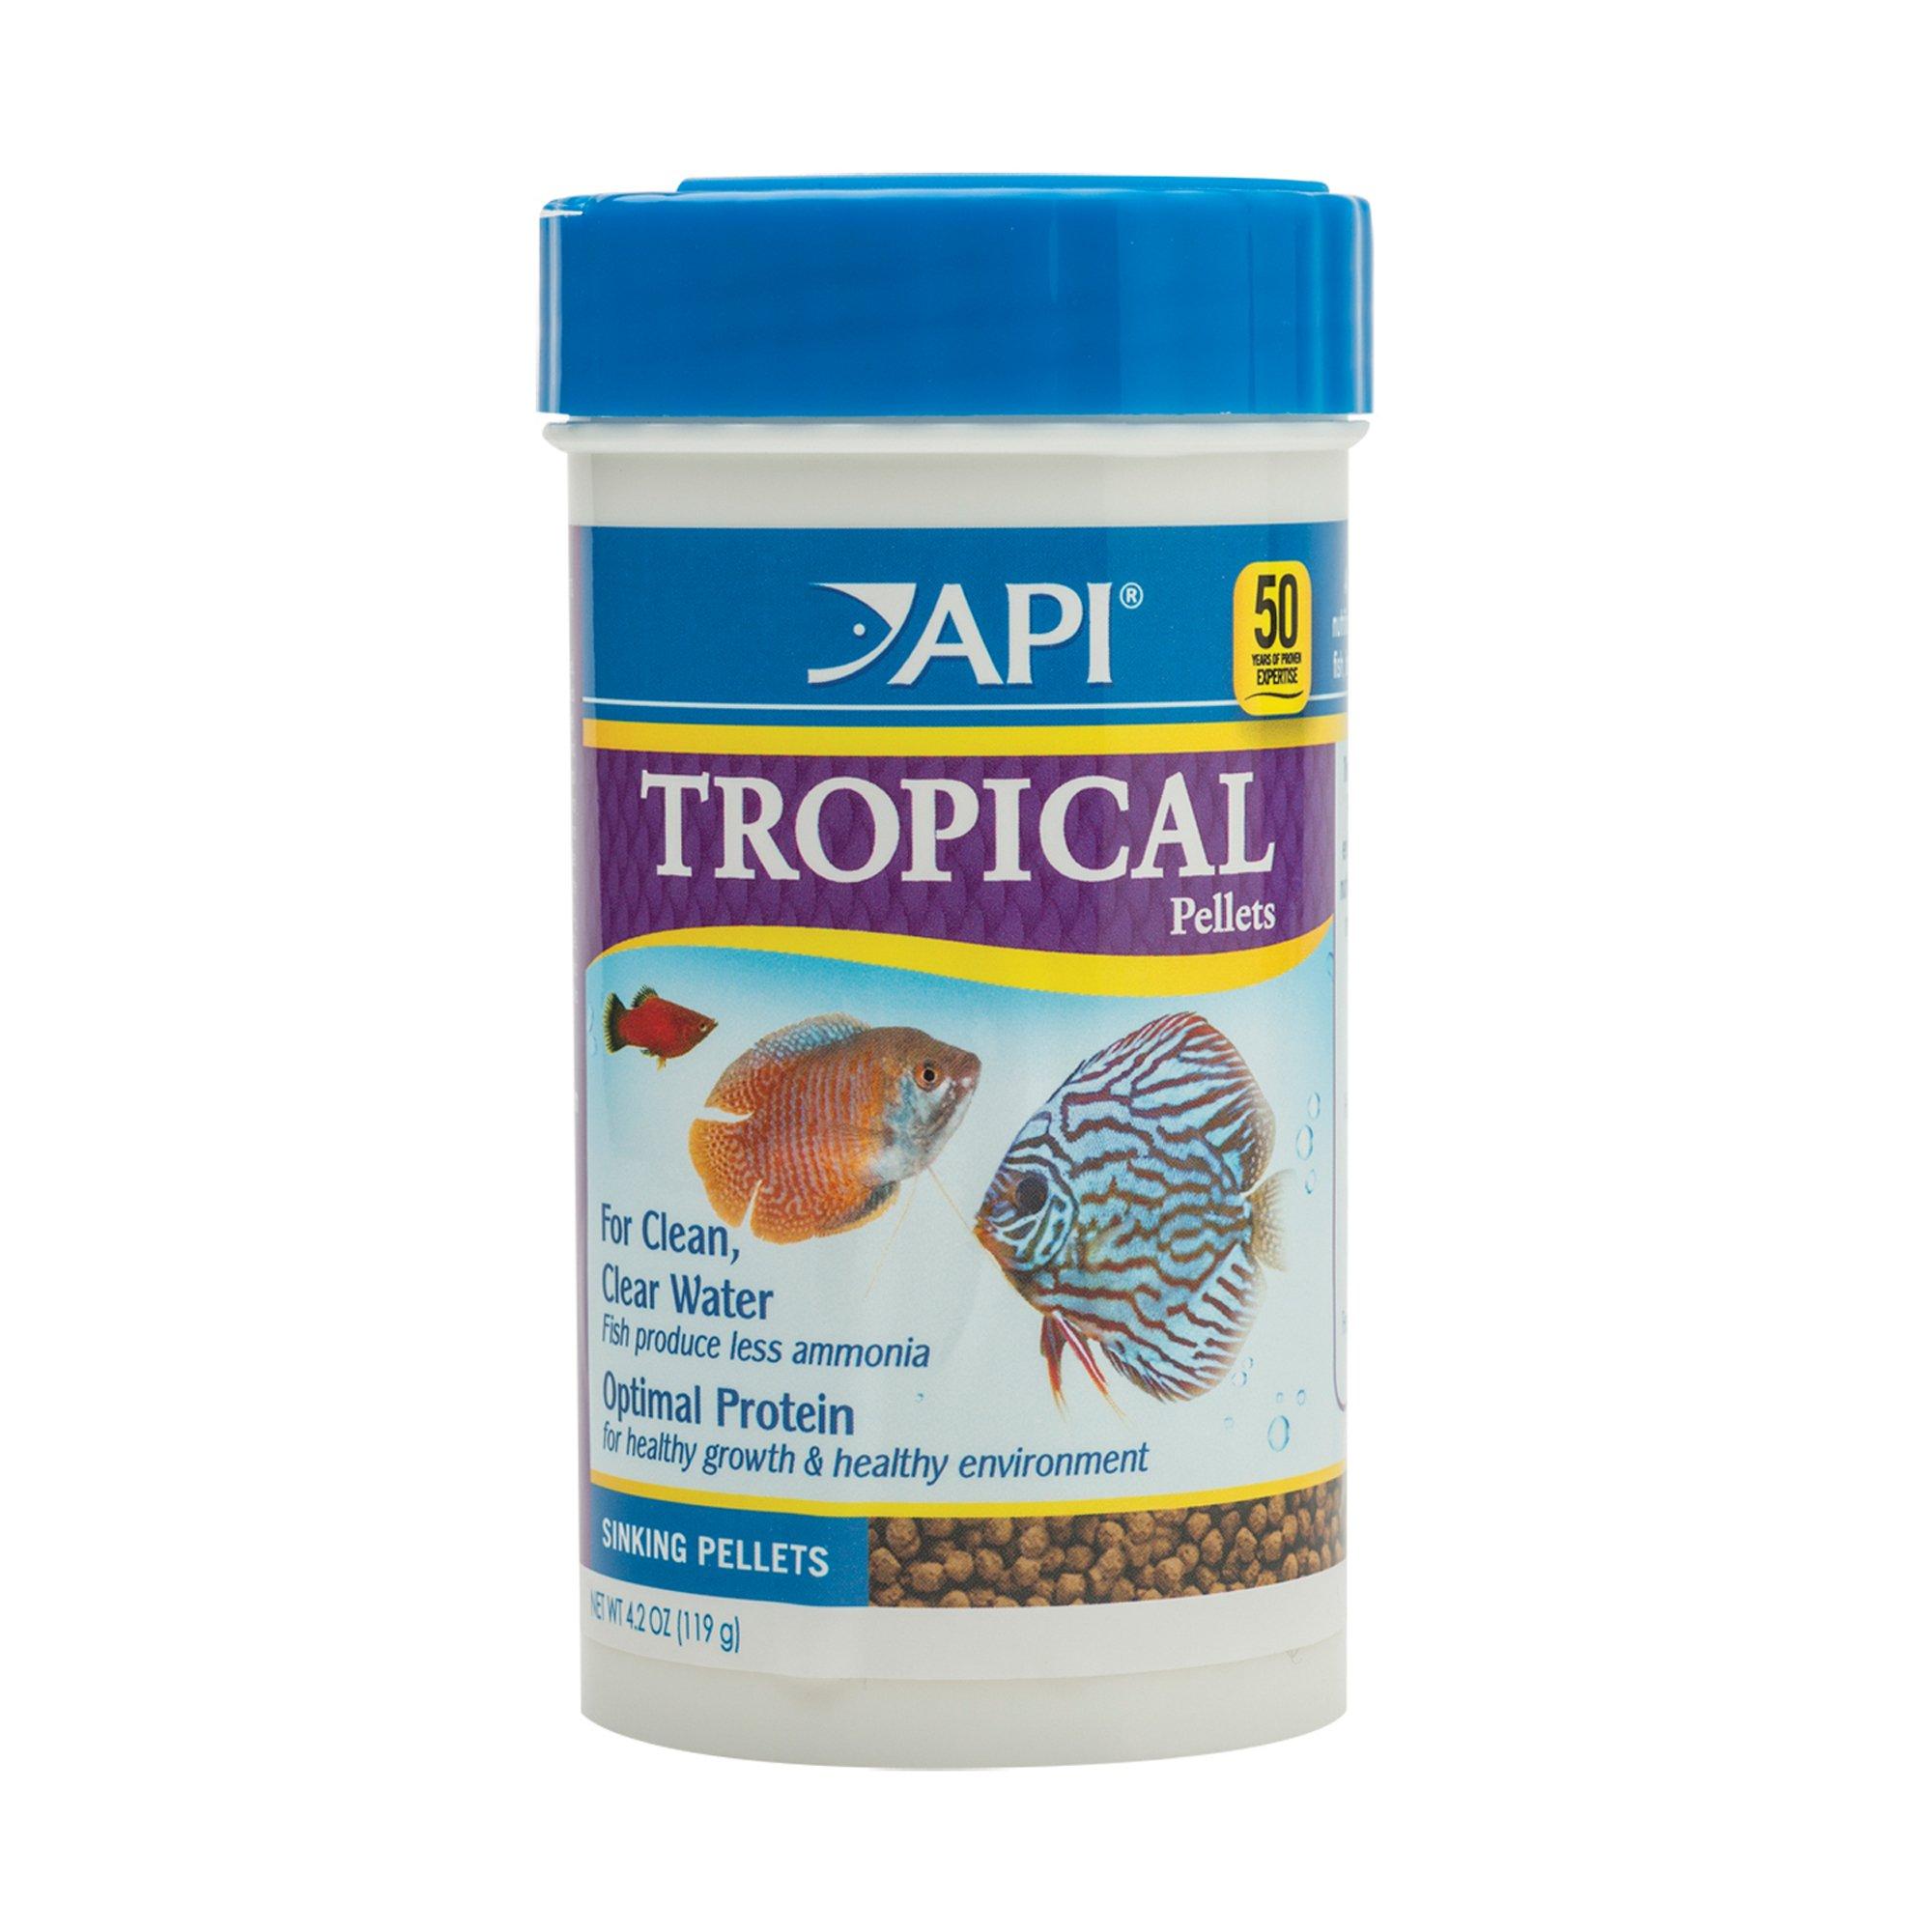 Api tropical pellets sinking pellets fish food petco for Petco fish food